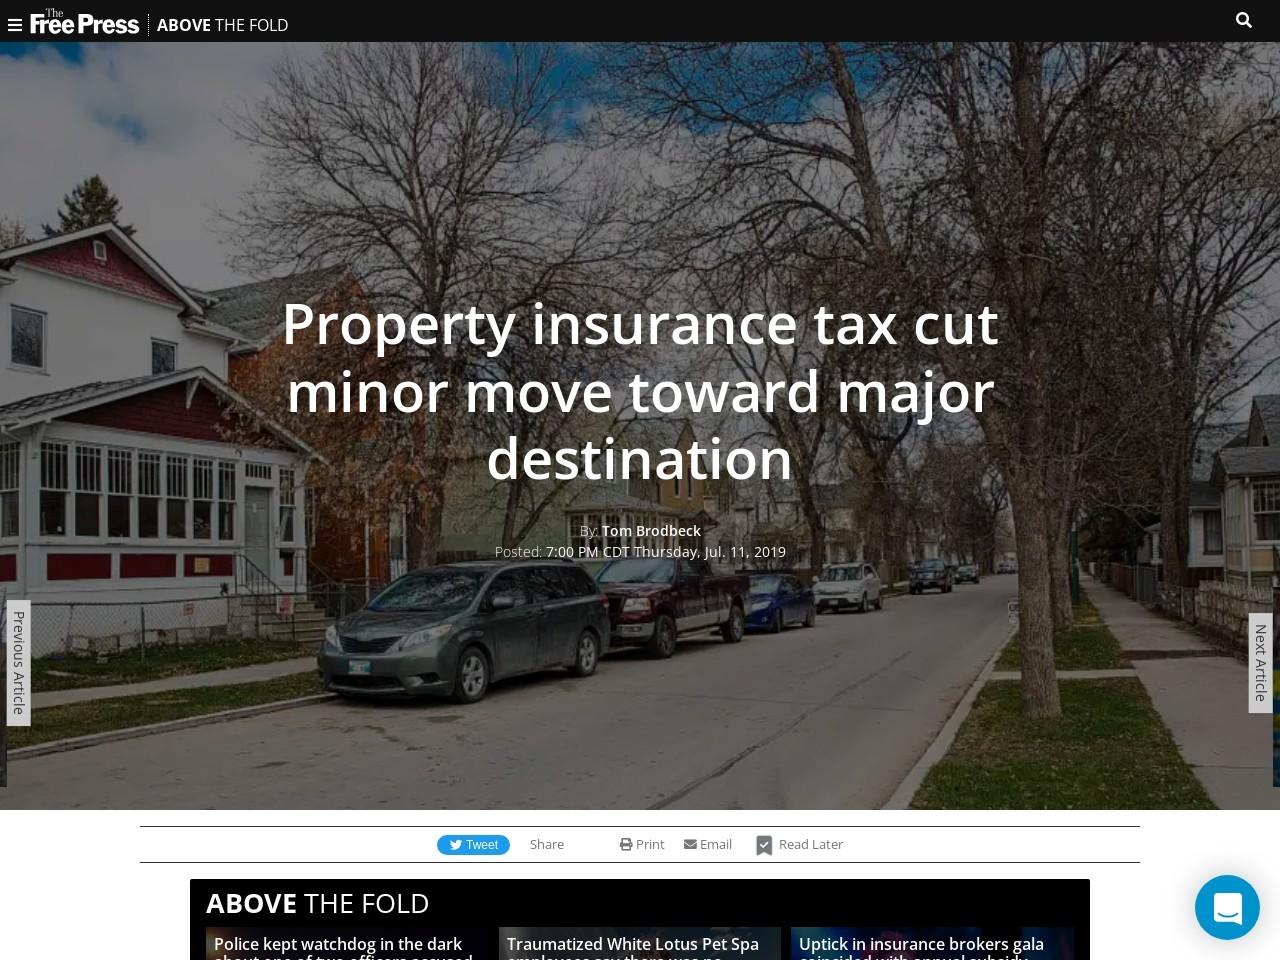 Property insurance tax cut minor move toward major destination